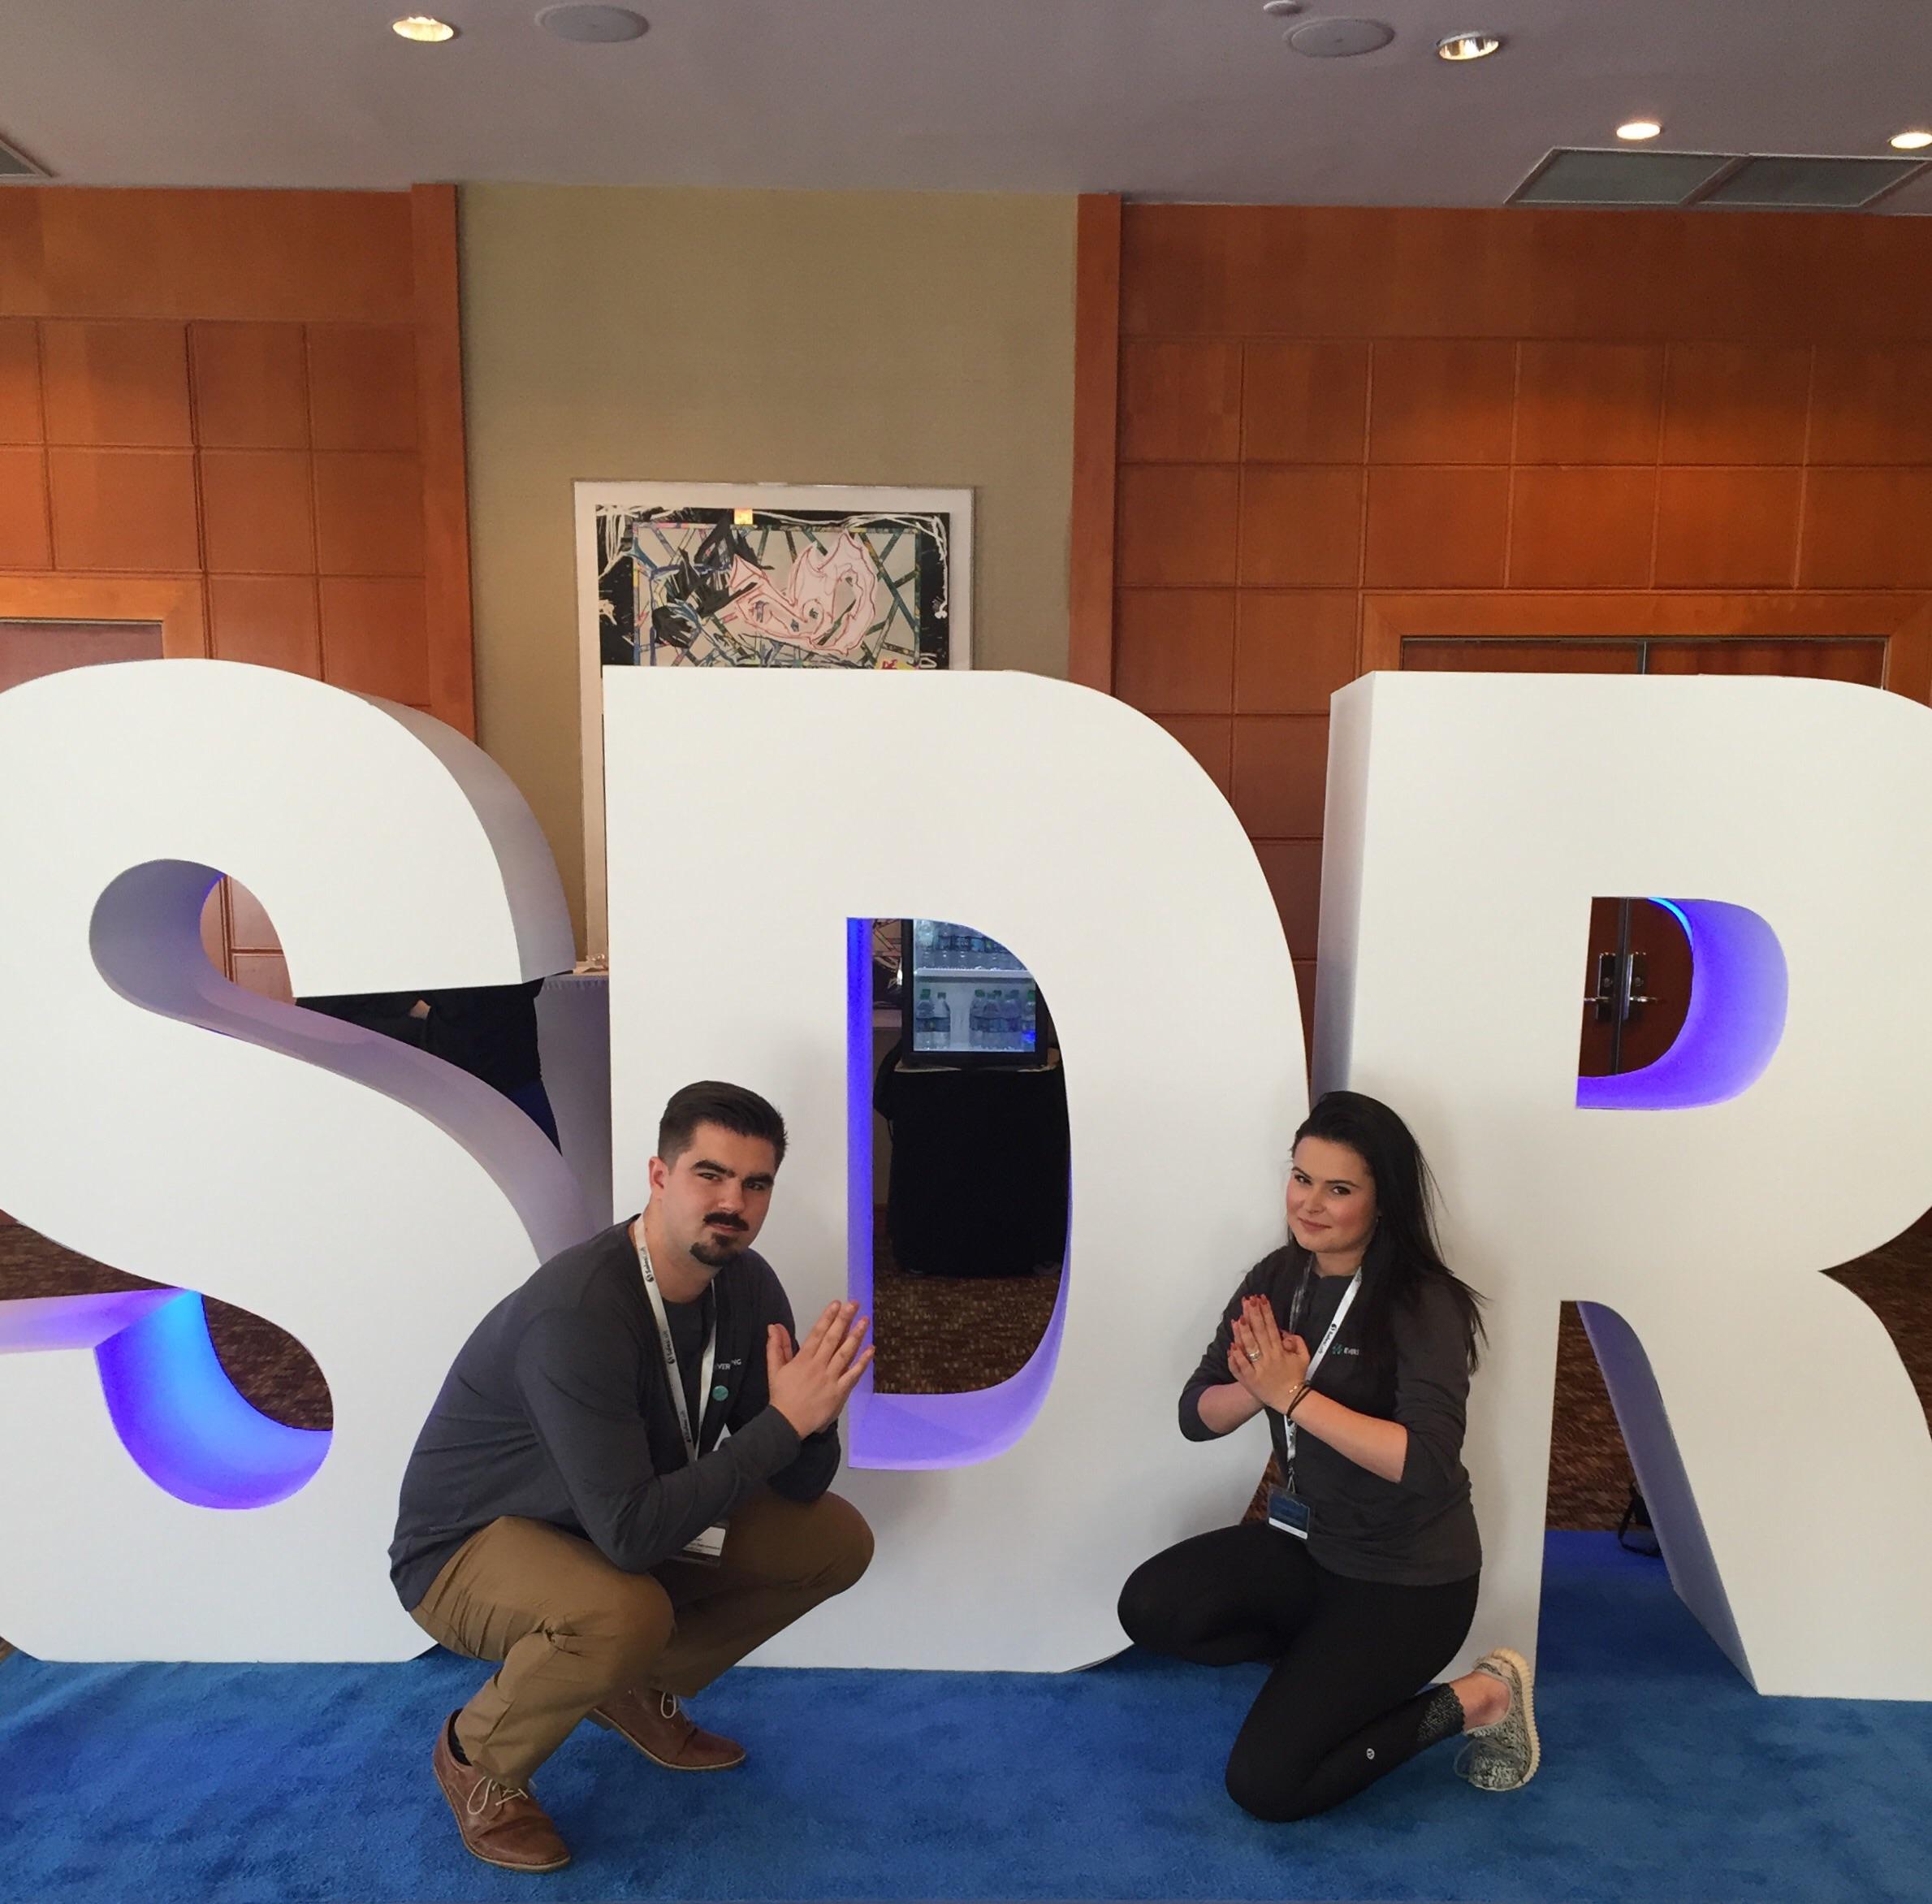 SDR Reps - EverString Team